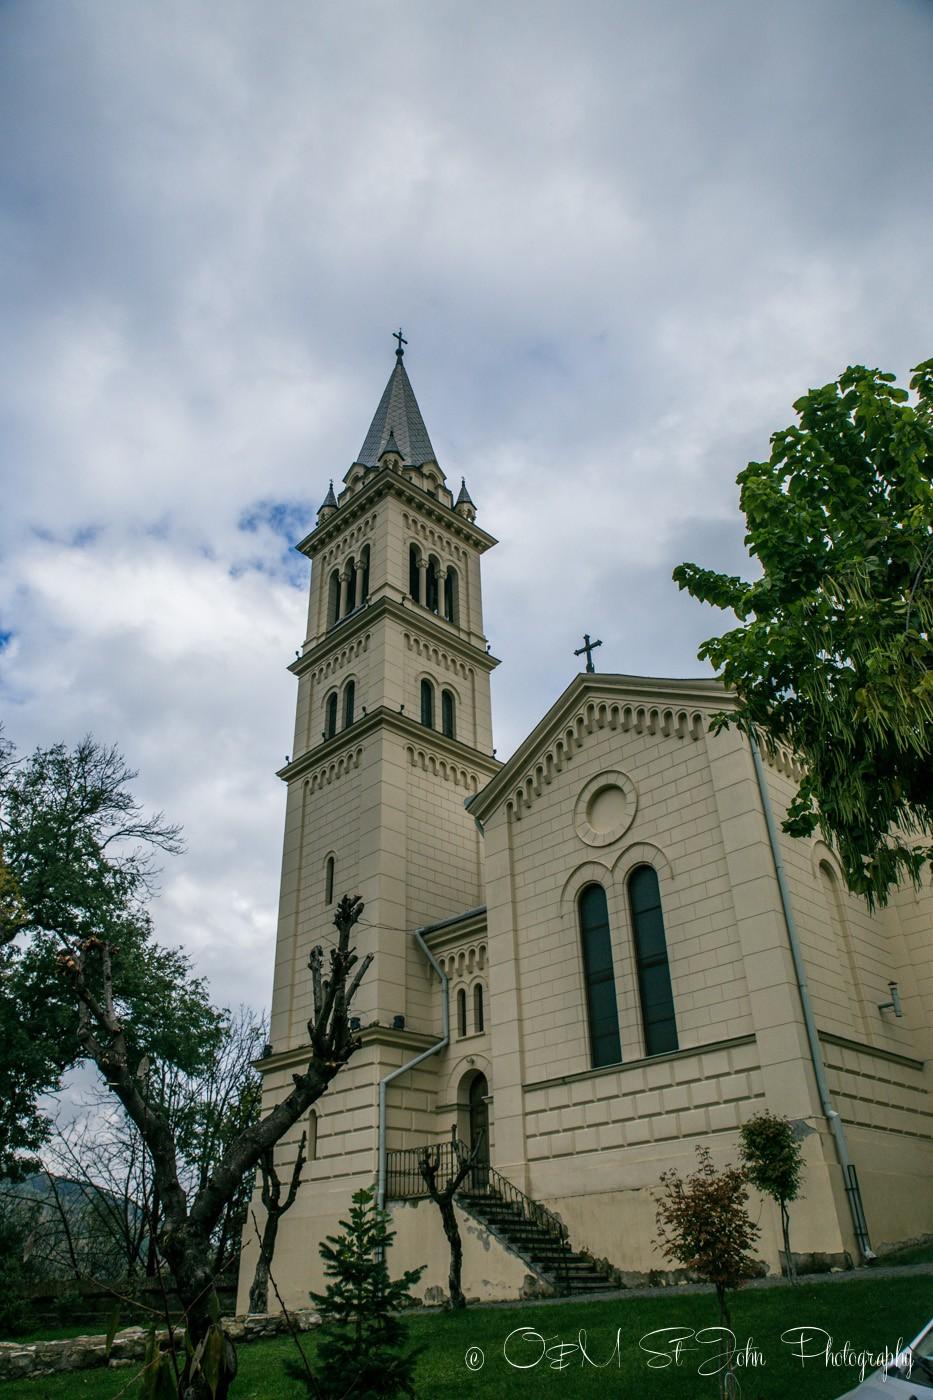 Monastery Church. Biserica Mânăstirii. Sighisoara. Romania